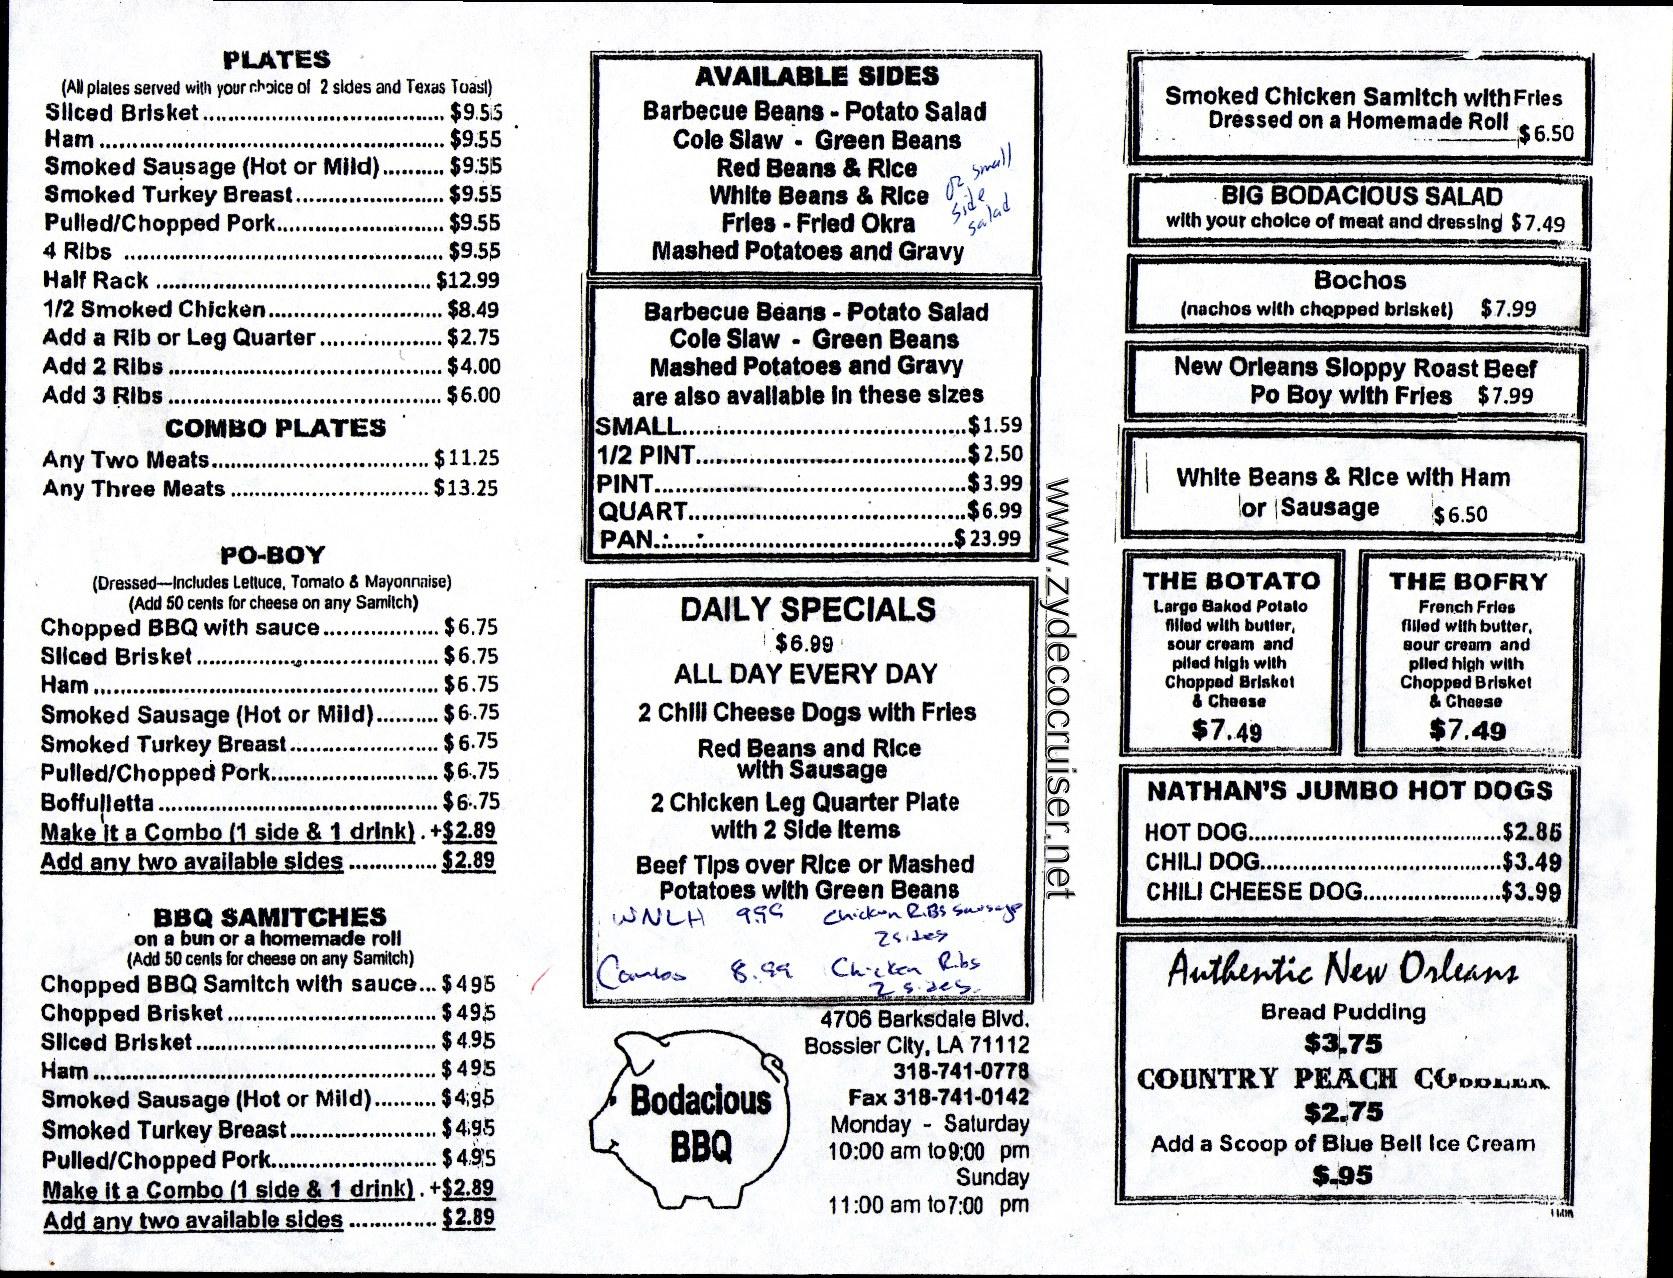 001: Bodacious BBQ, Bossier City, Menu Louisiana